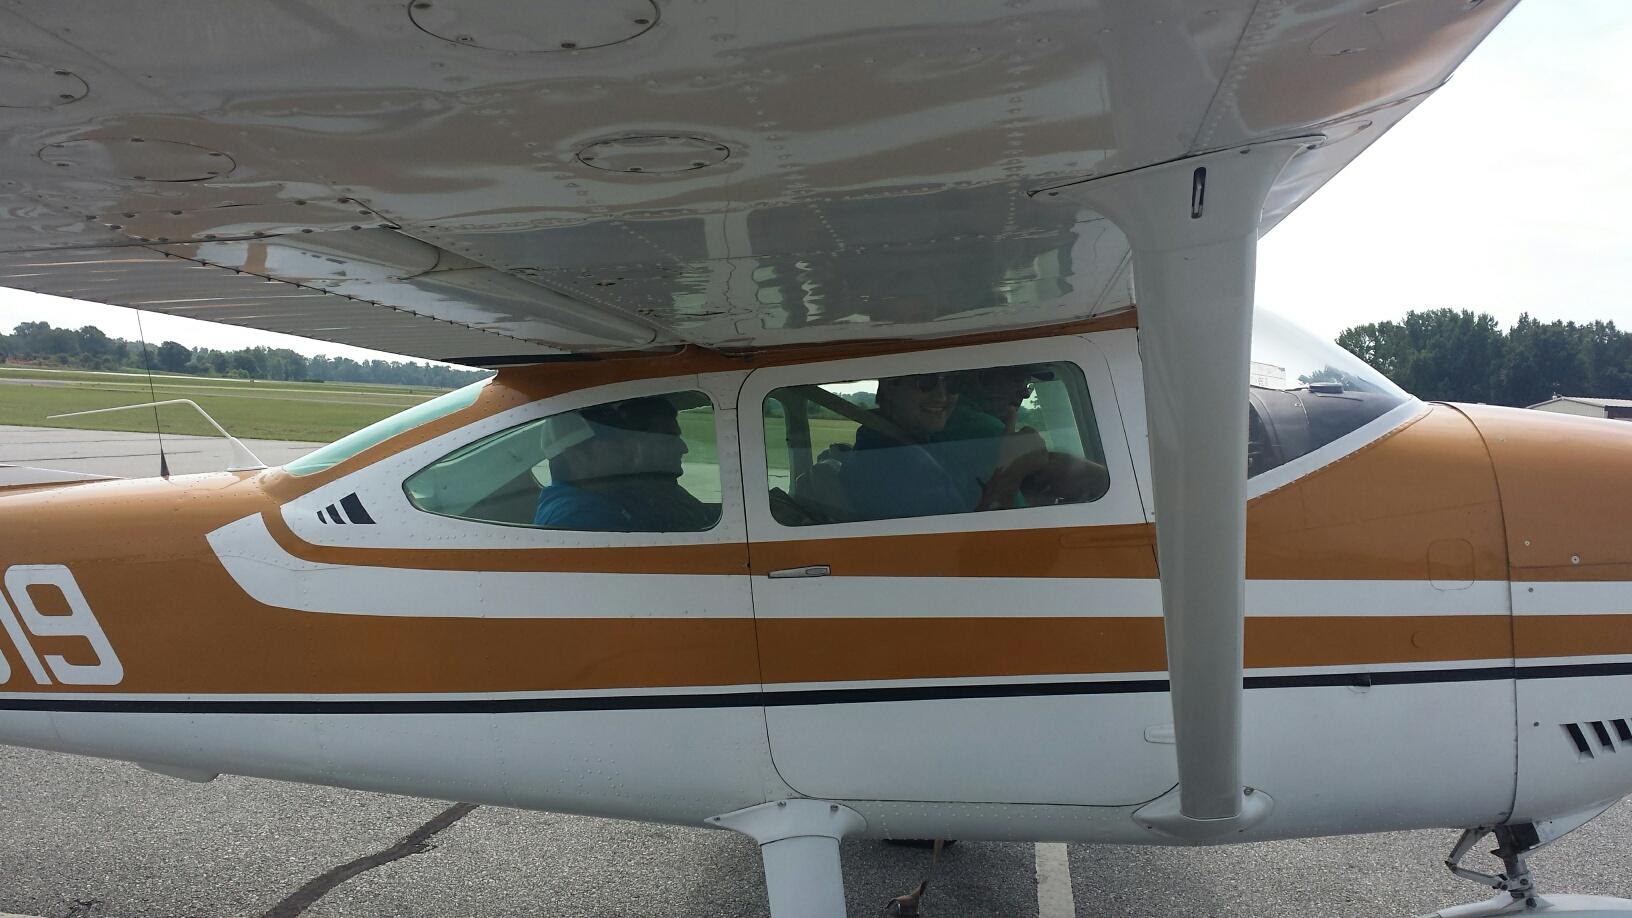 Guys-on-a-plane.jpg